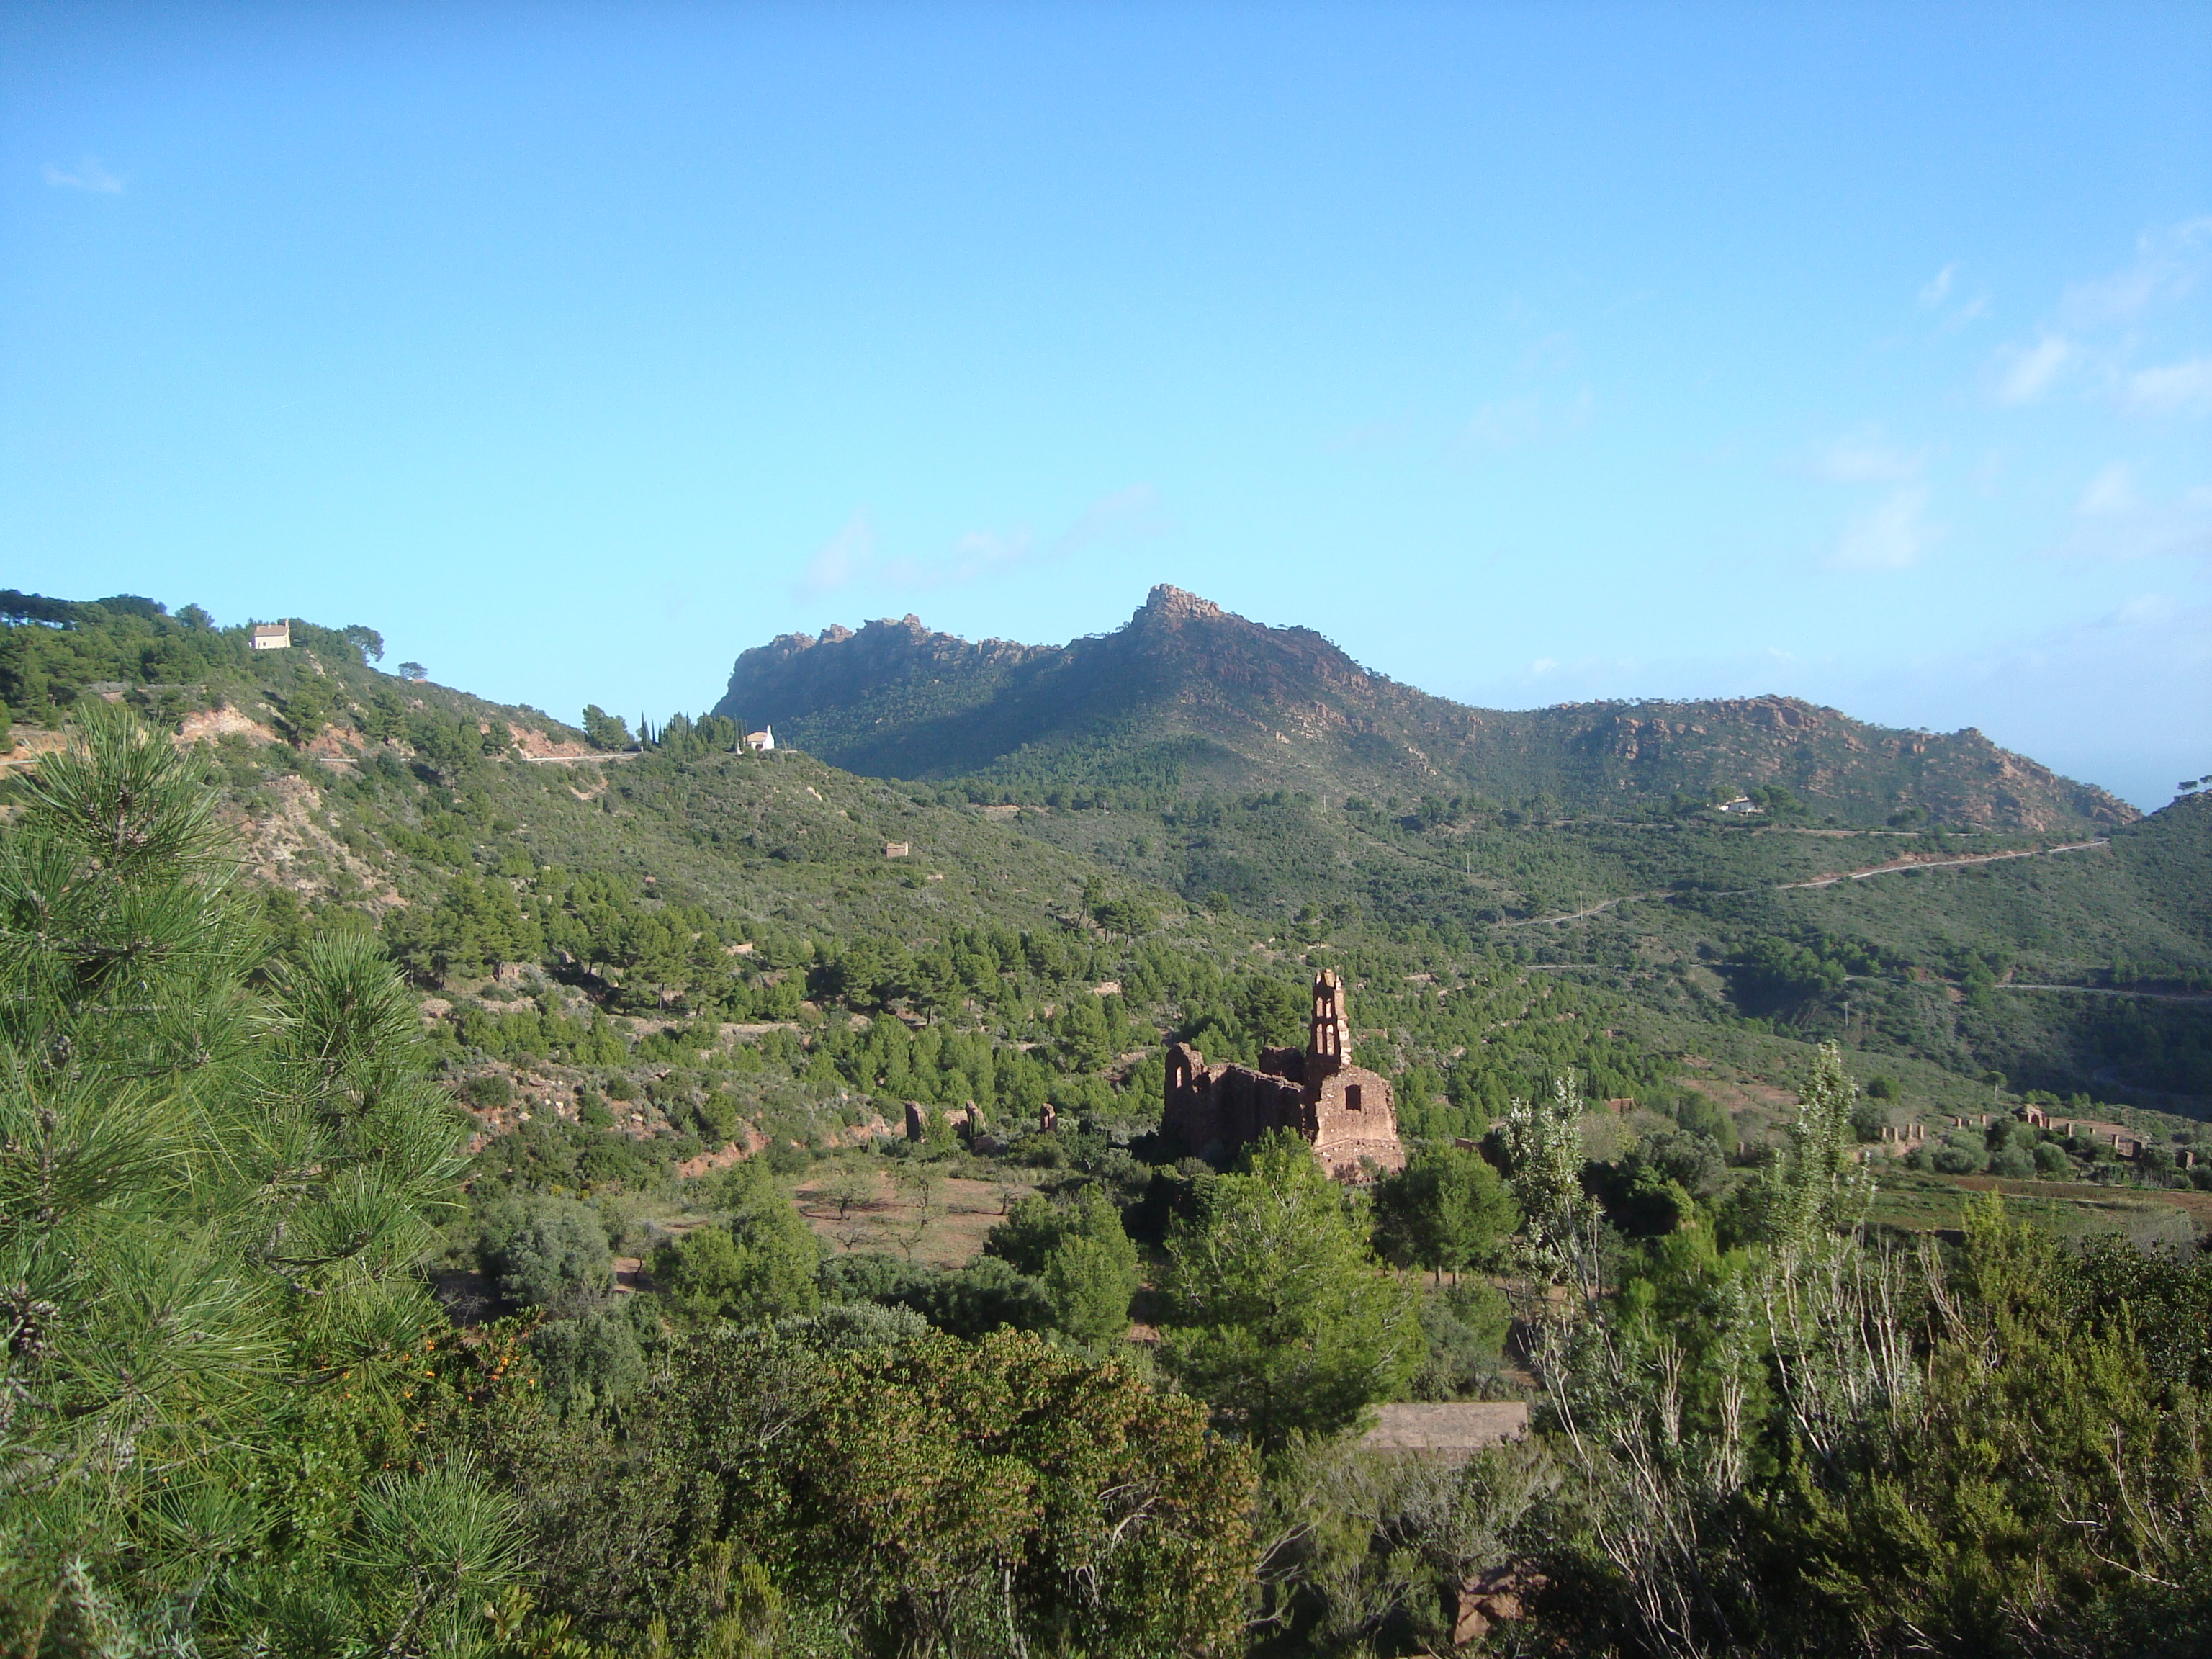 Panorámica del Desert de Les Palmes en Benicasim. Imagen: Juan Emilio Prades Bel / Wikipedia